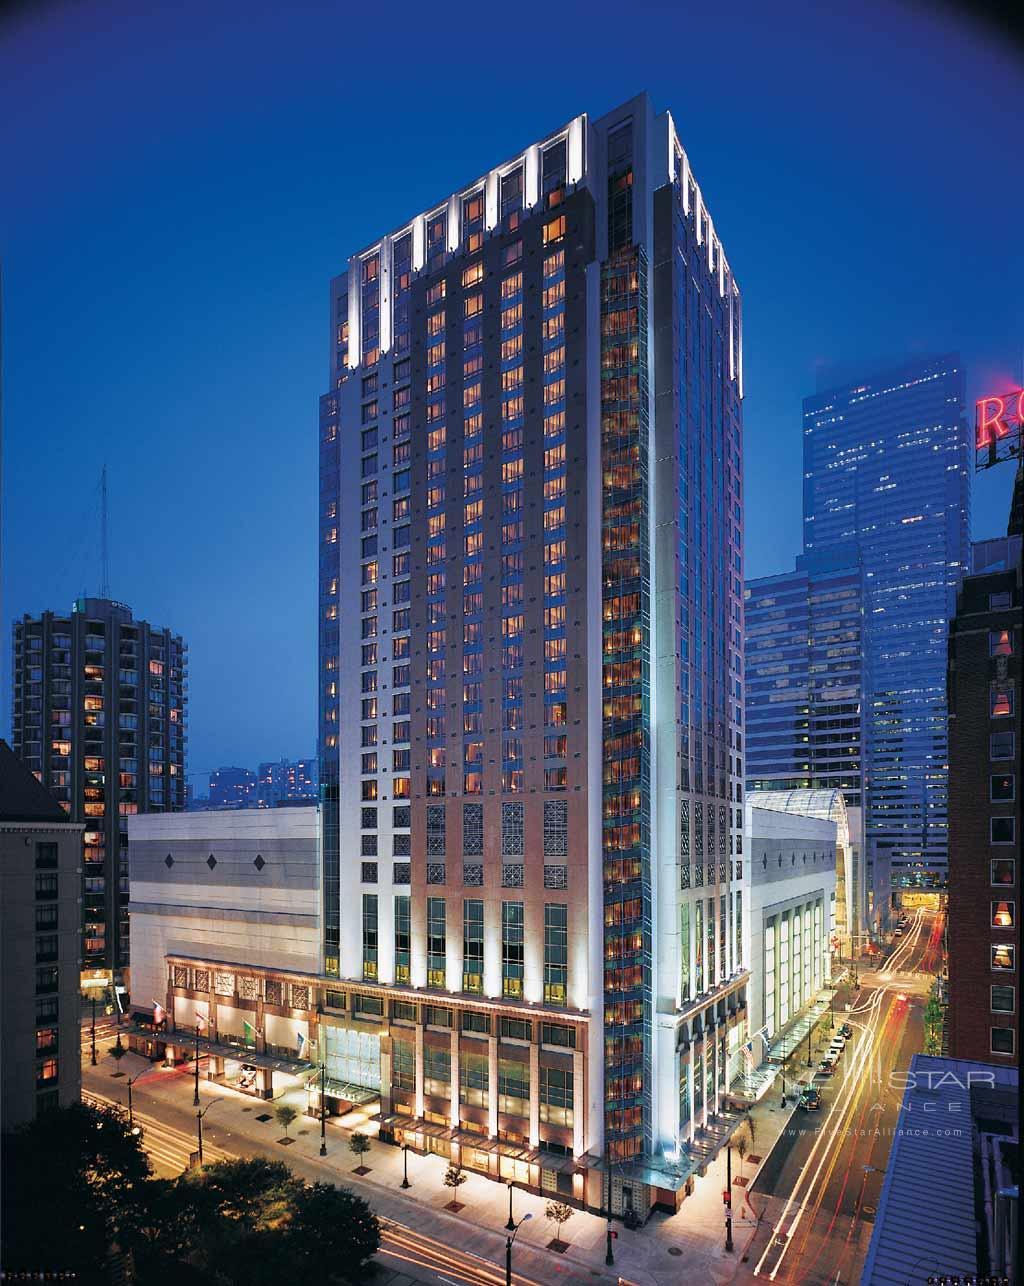 Grand Hyatt Seattle, WA